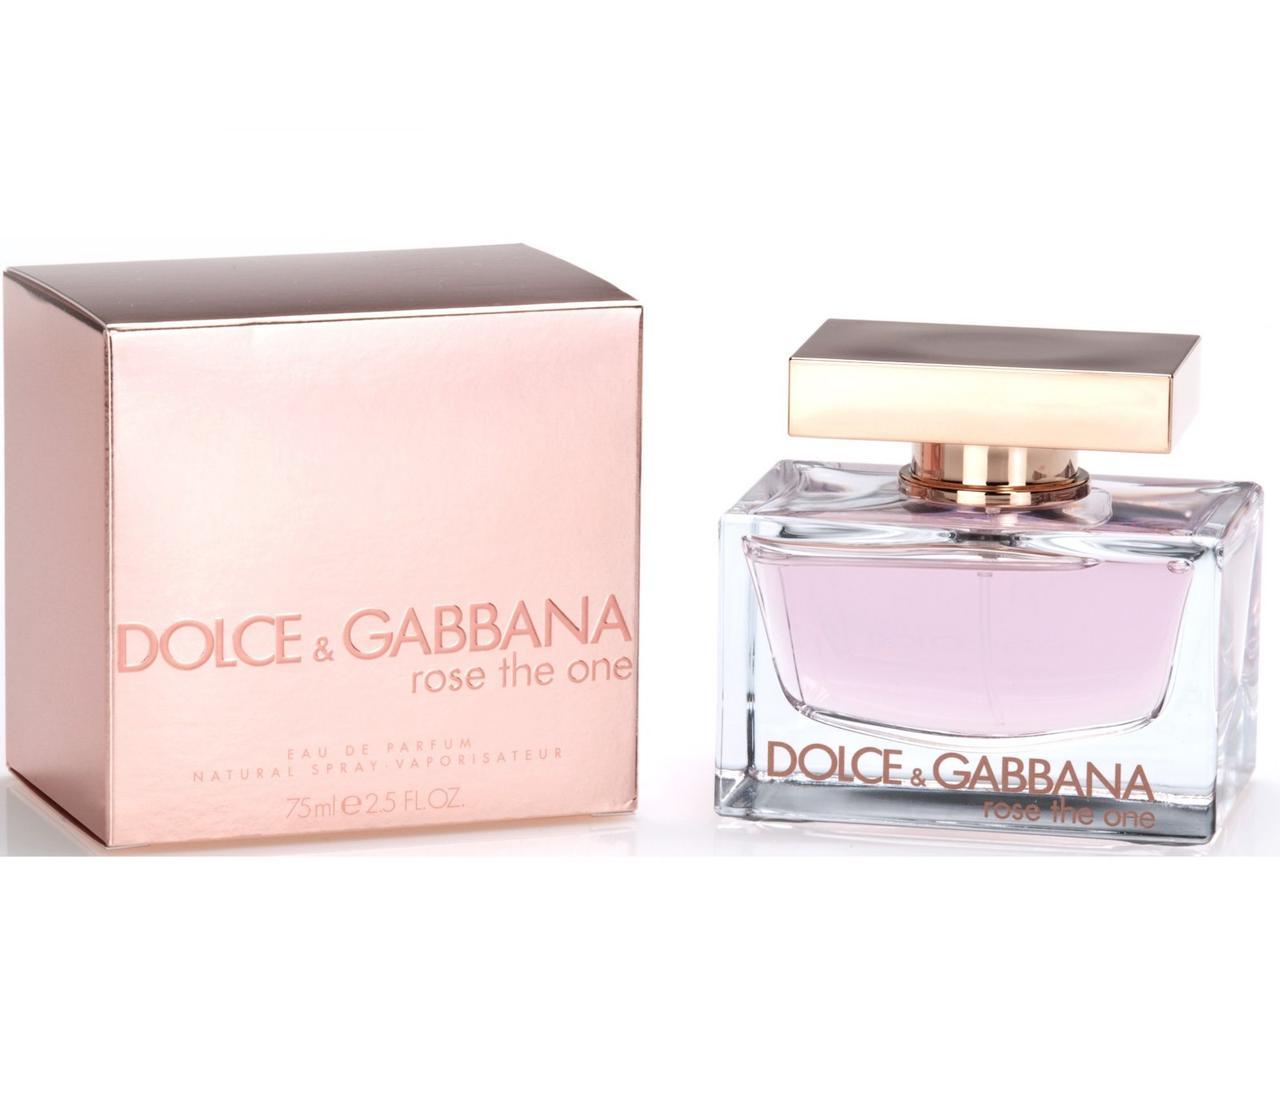 Dolce & Gabbana Rose The One Парфюмированная вода EDP 75ml (Дольче Габана Роуз Зе Ван) Женский Парфюм Духи EDT